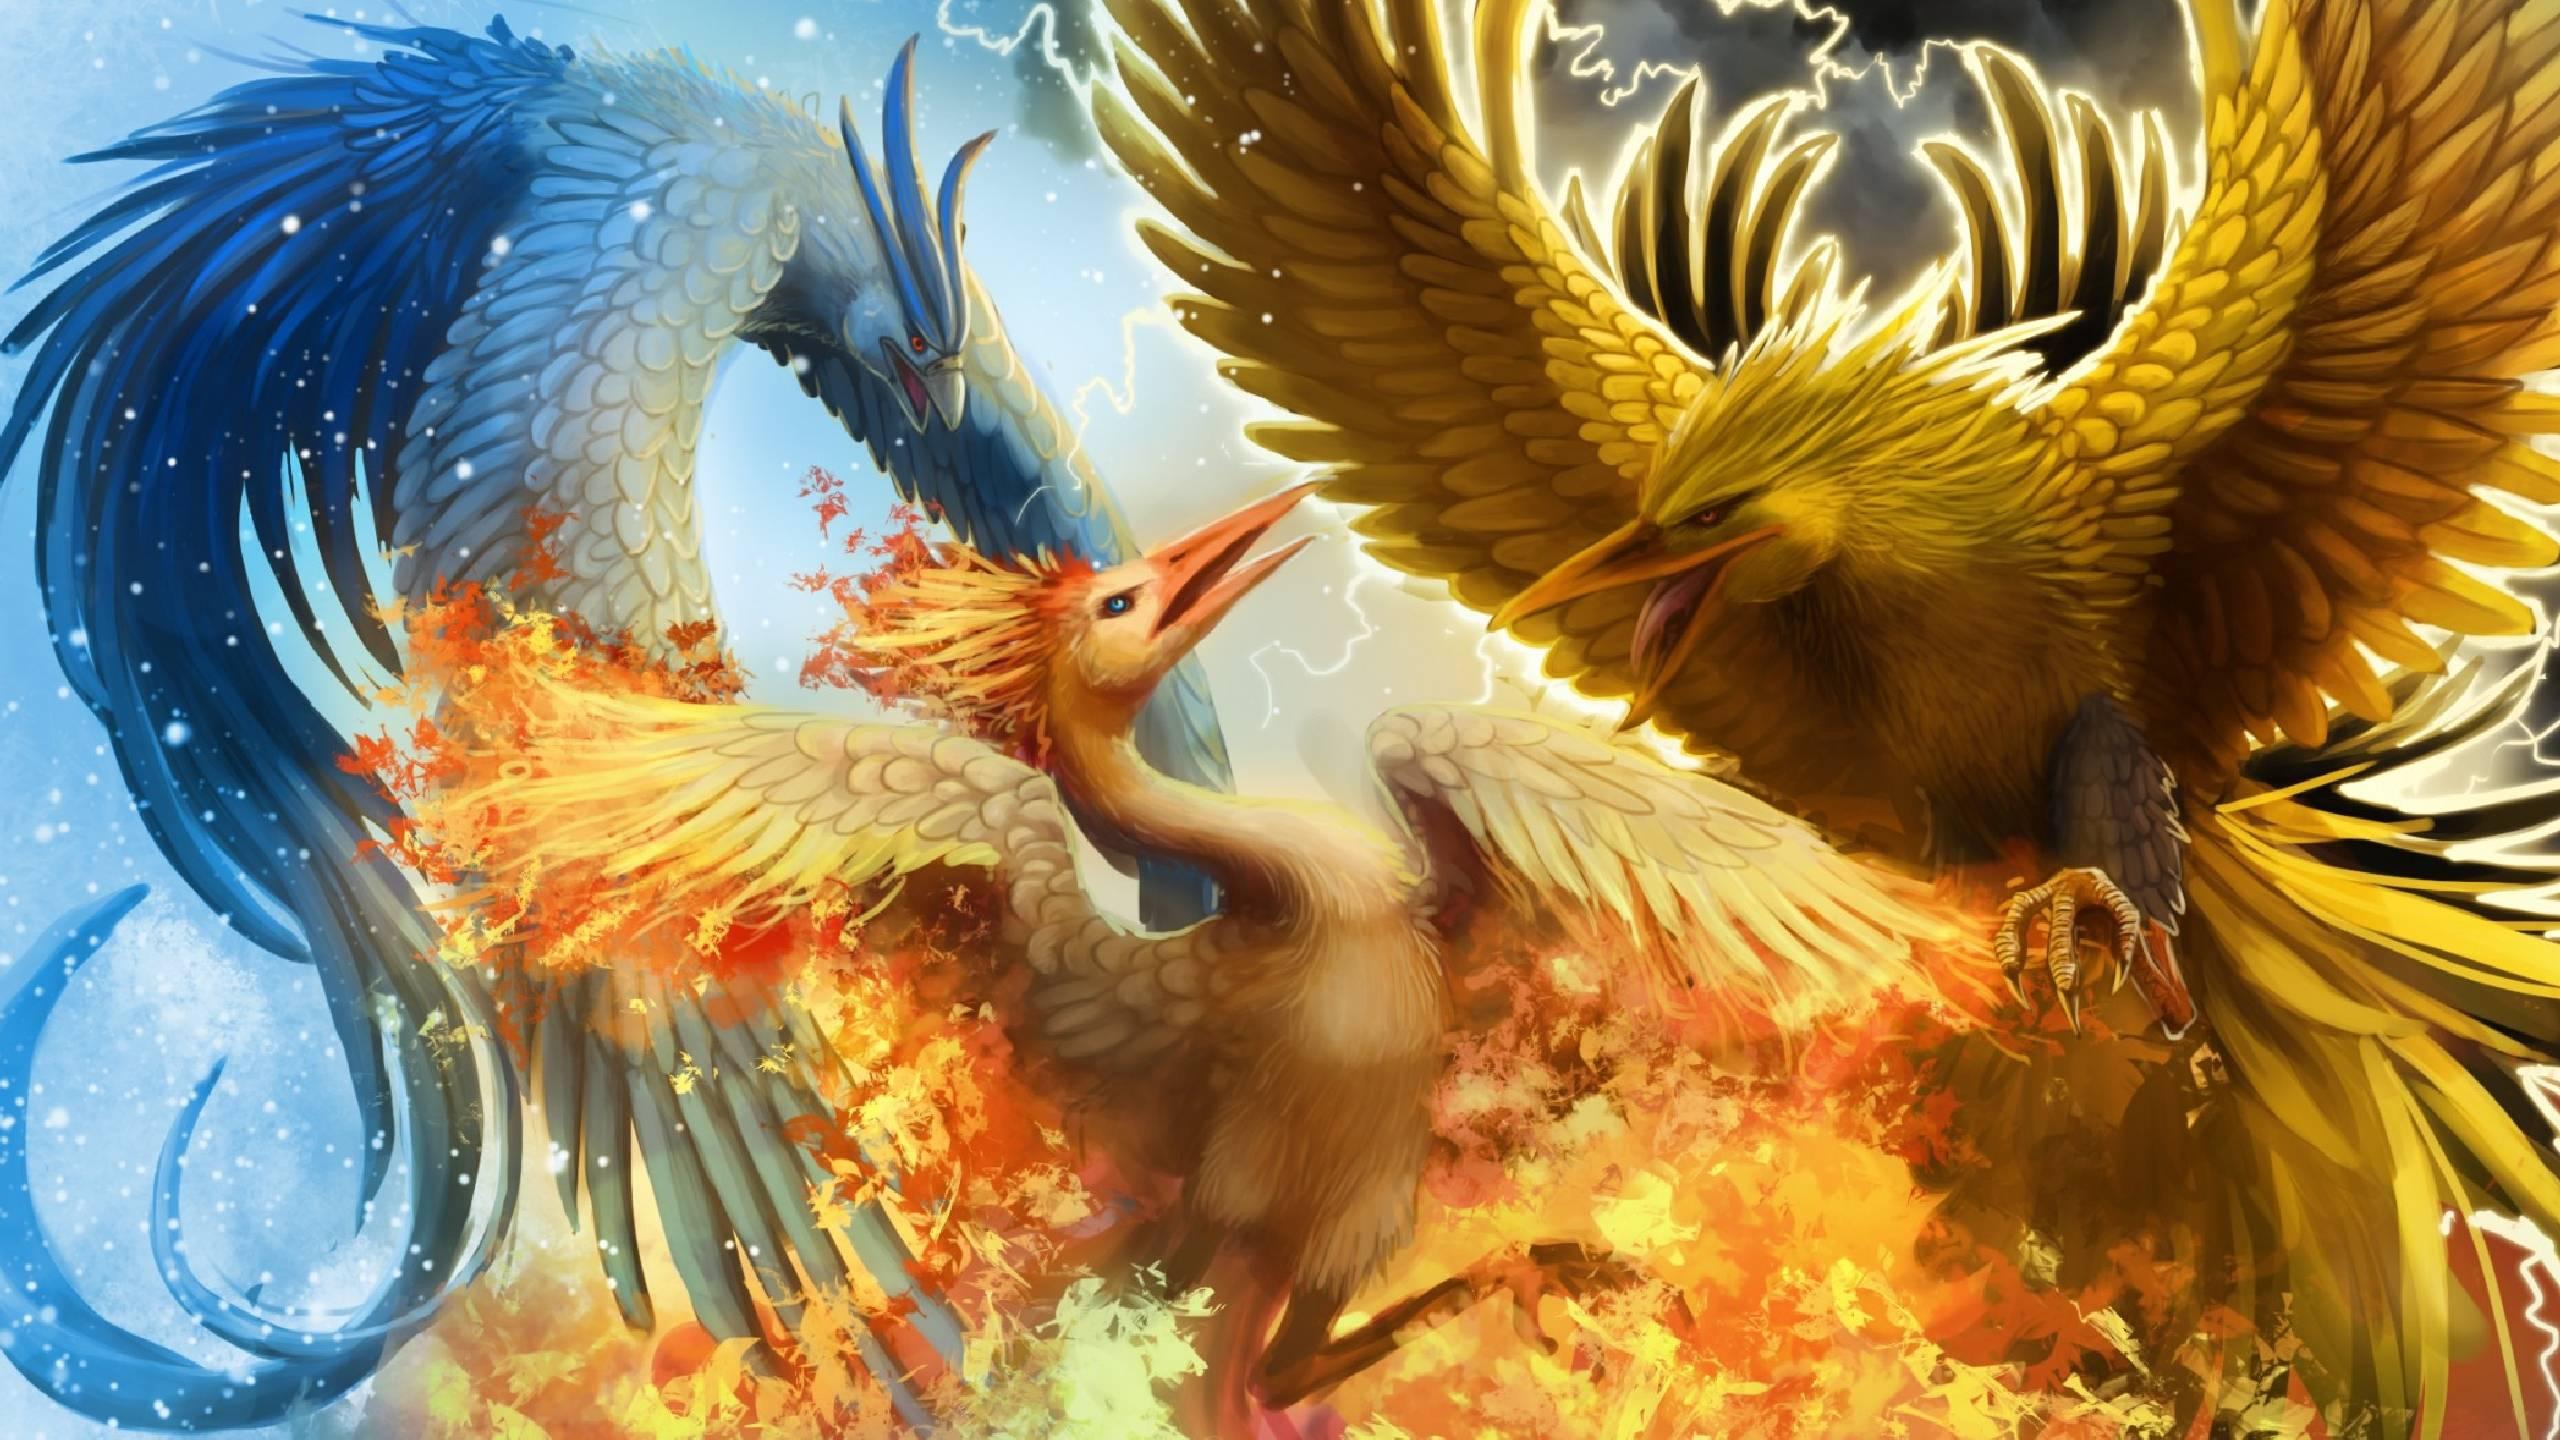 1032 Pokemon Wallpapers | Pokemon Backgrounds